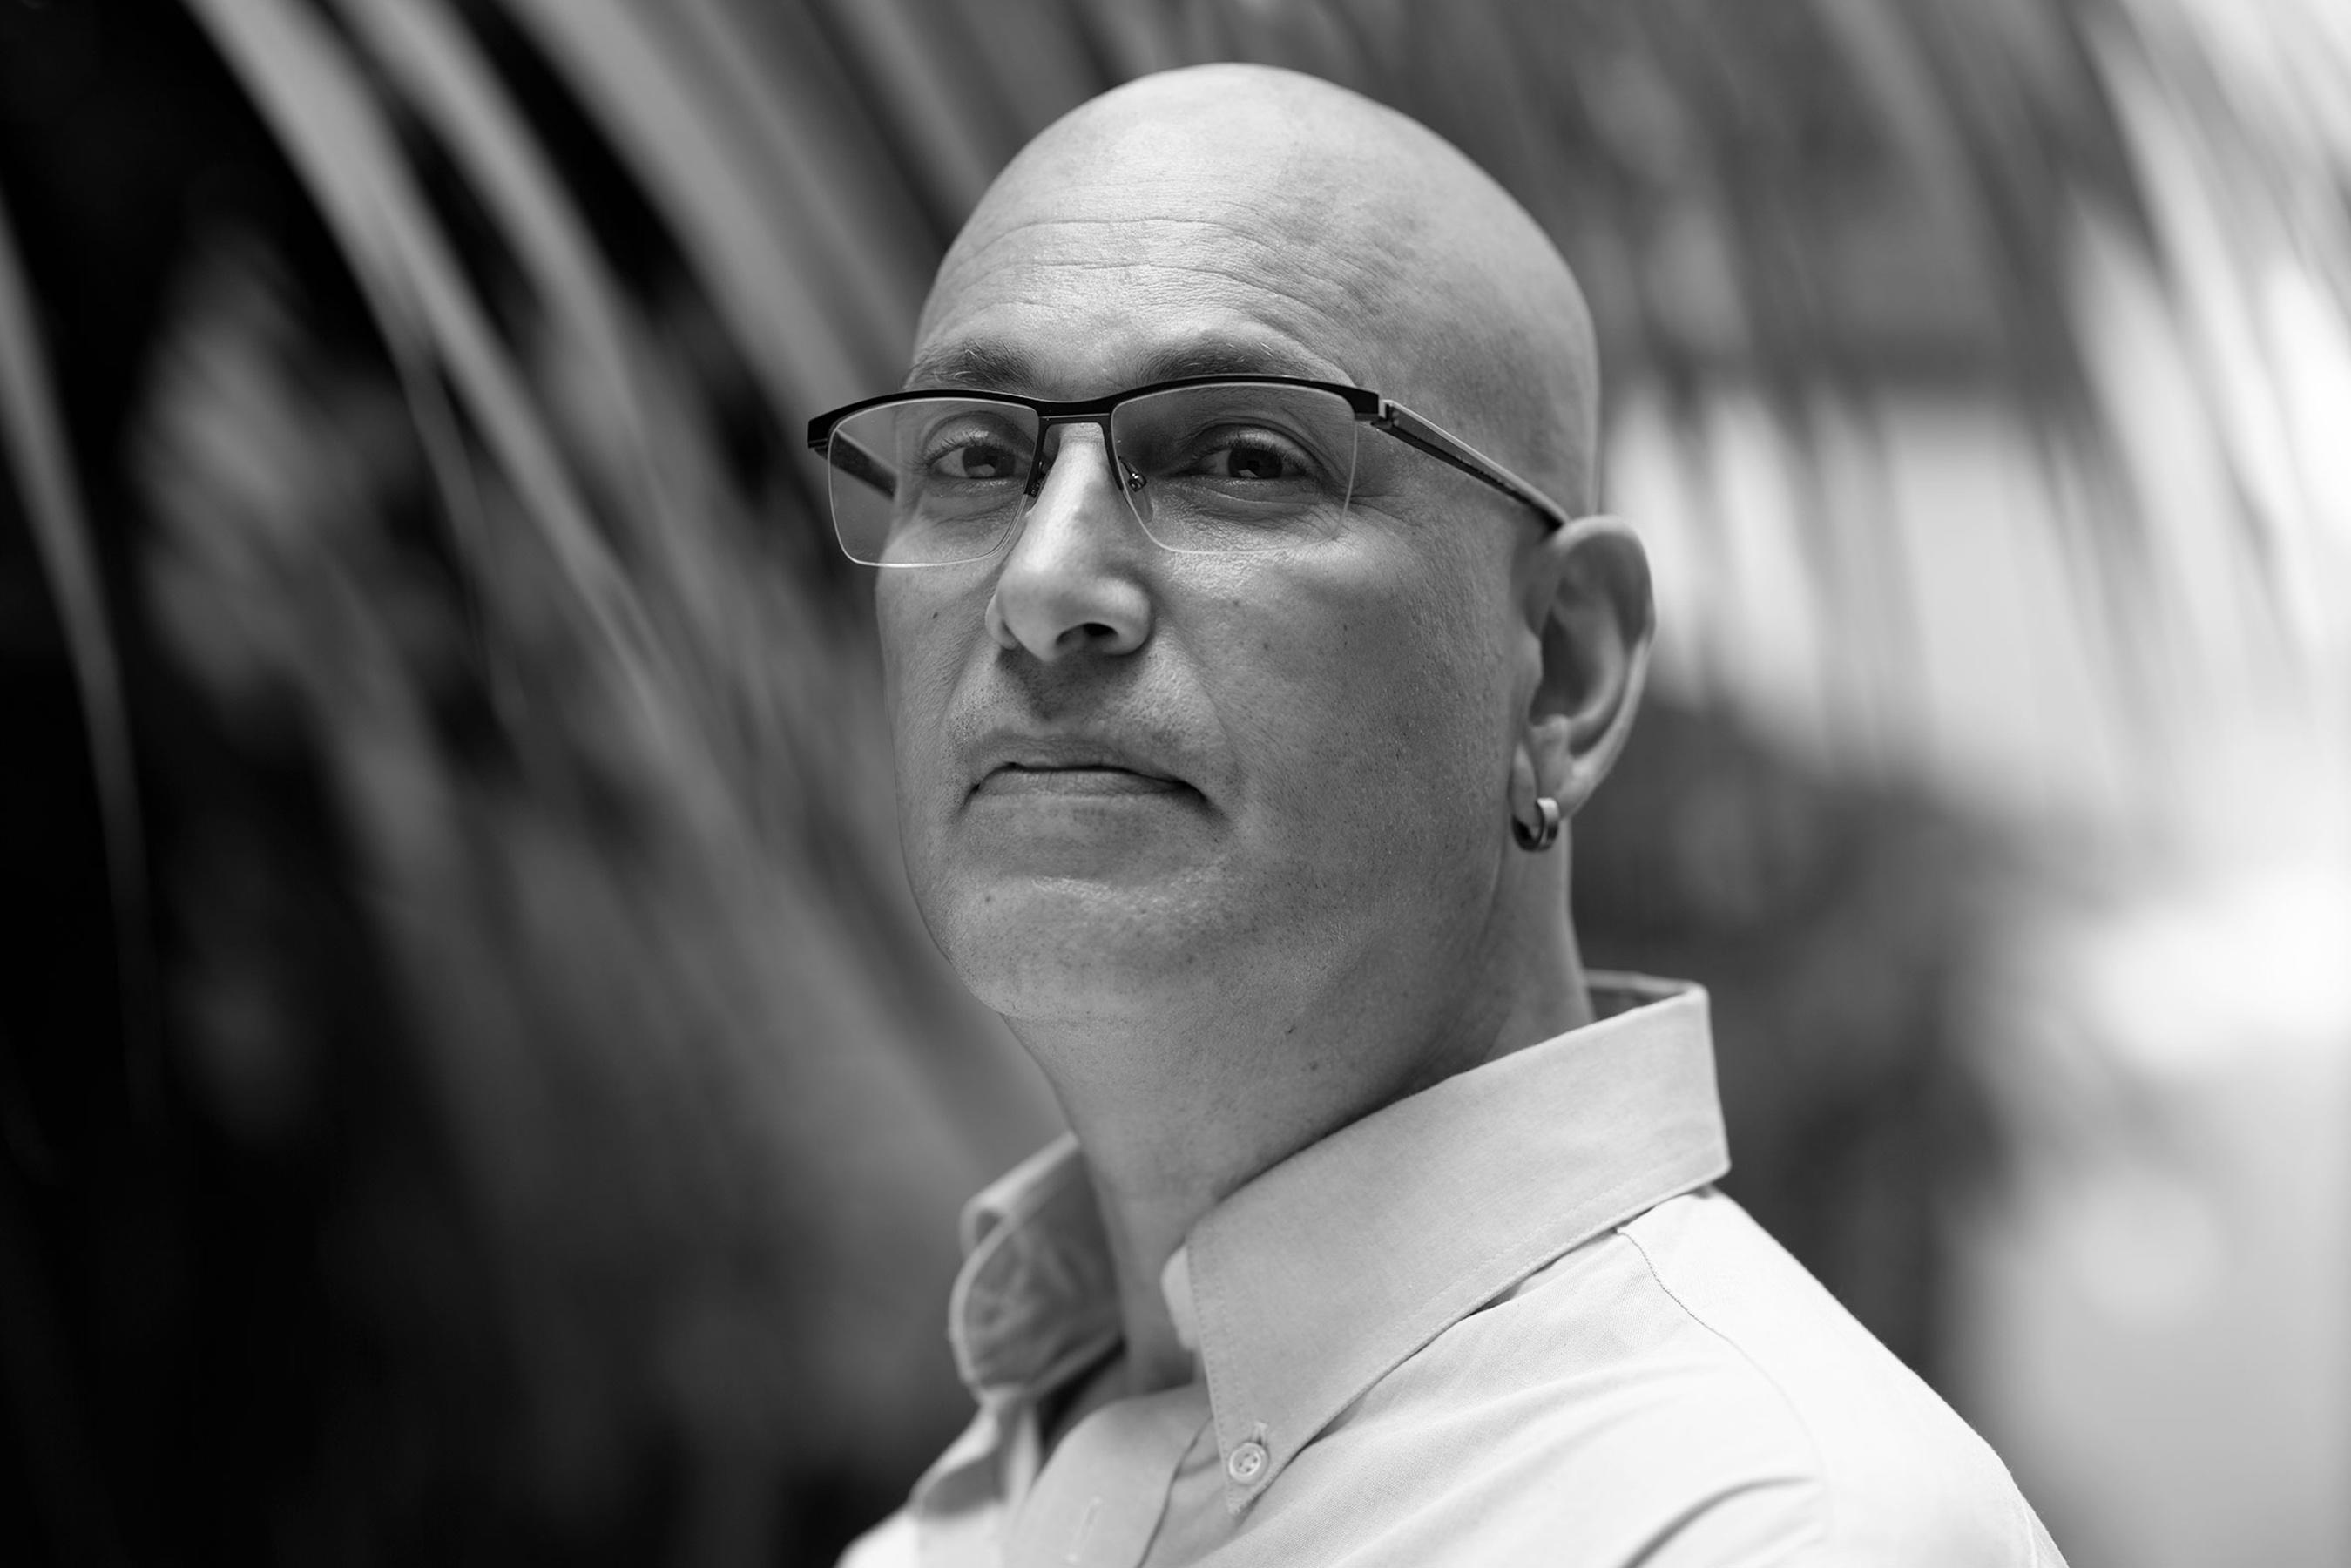 Meet Artist Jorge Rodriguez-Gerada